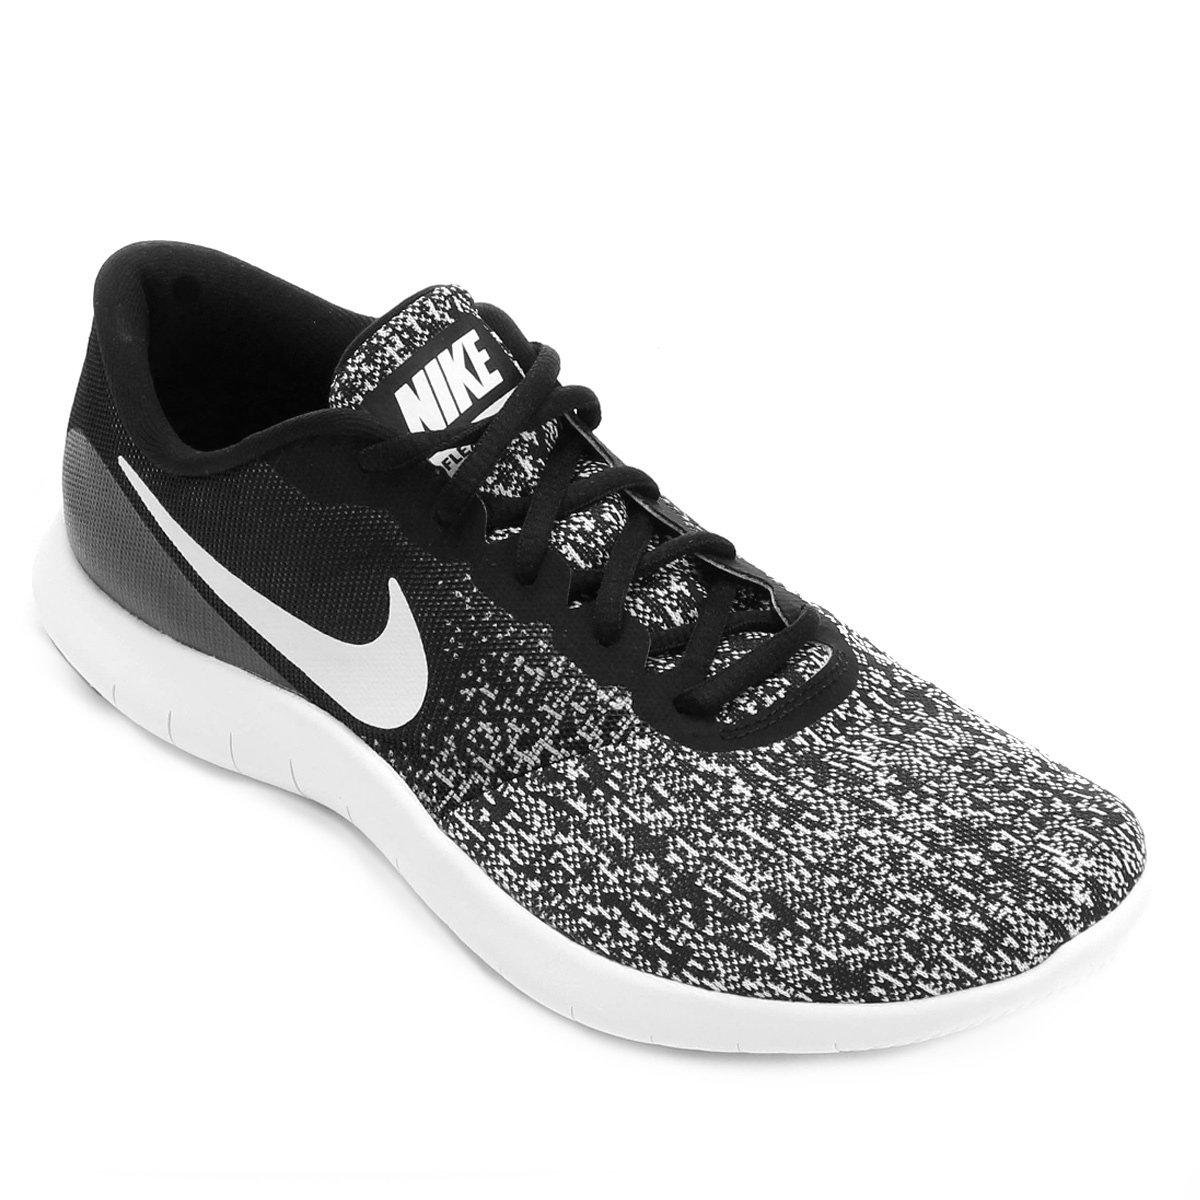 e297370967 Tênis Nike Flex Contact Masculino - Preto e Branco - Compre Agora ...